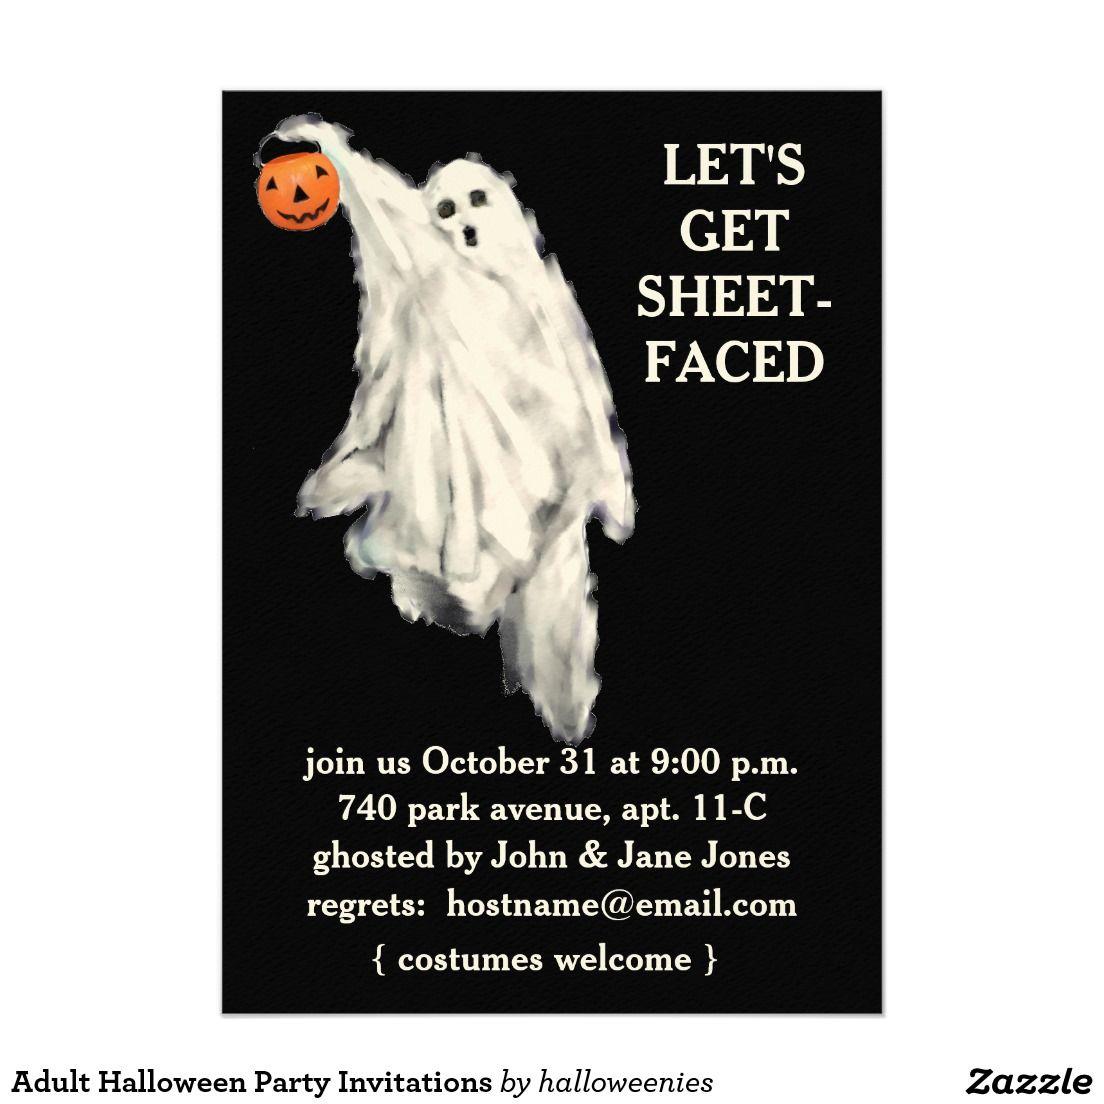 Adult Halloween Party Invitations   Halloween Party   Pinterest ...